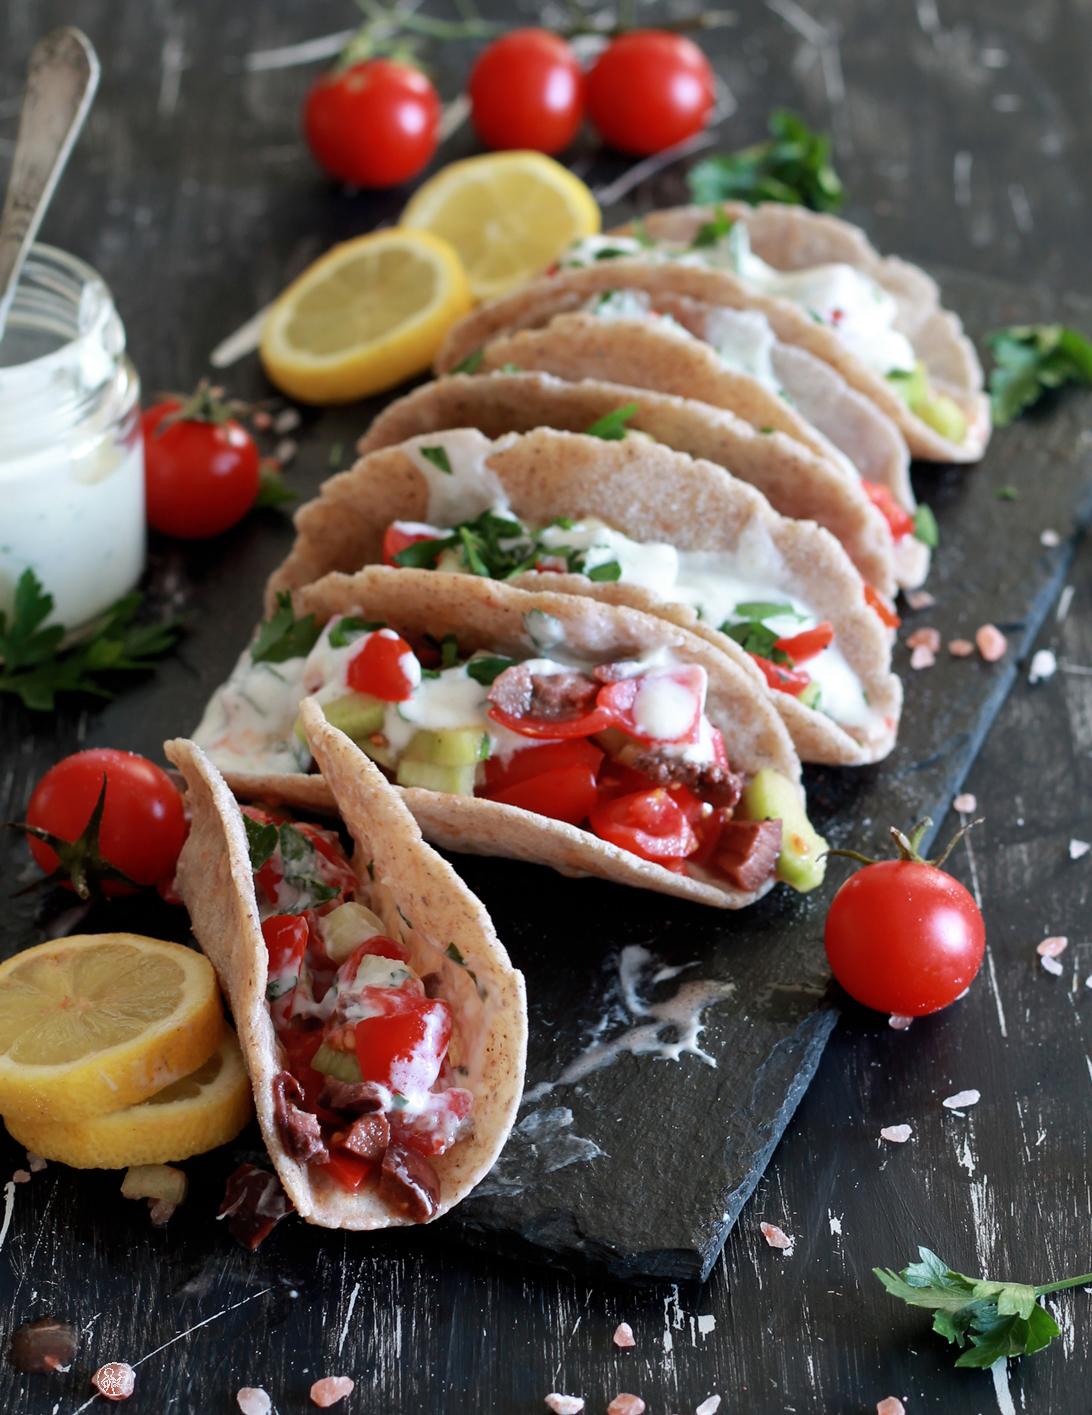 Faux tacos sans gluten au sarrasin - La Cassata Celiaca